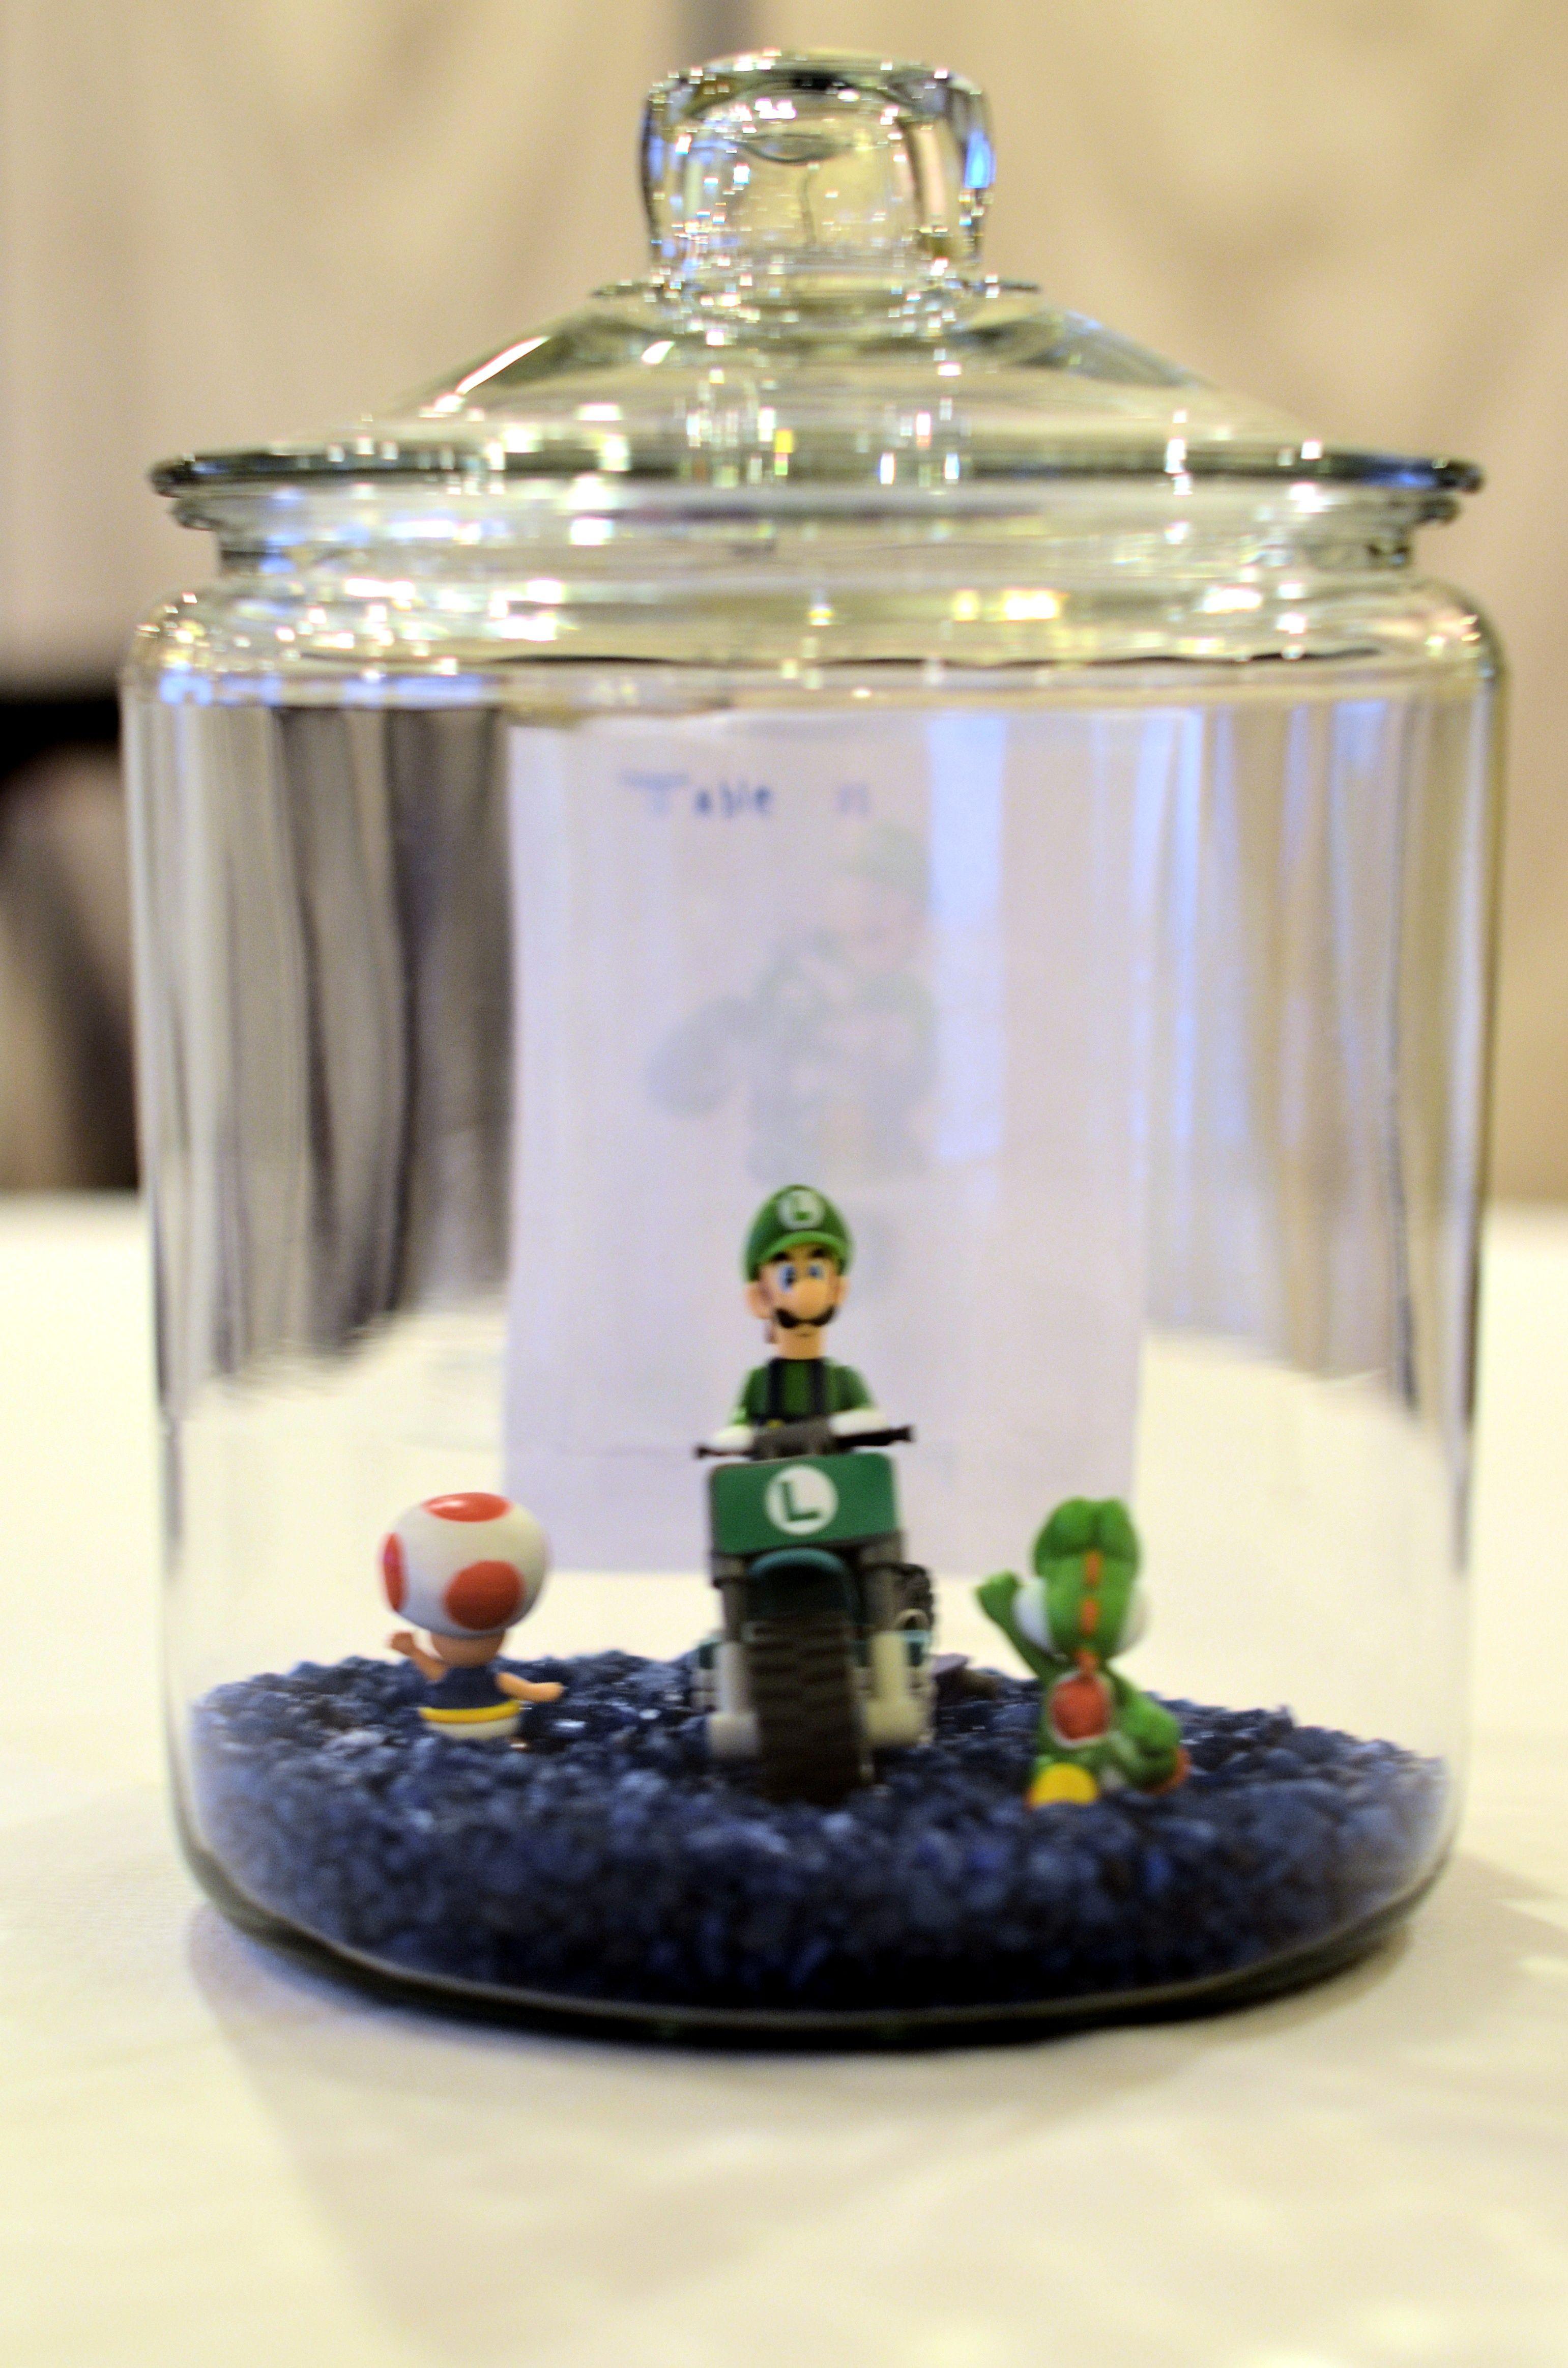 Luigi centerpiece | My Lego/Video Game Wedding | Pinterest | Luigi ...